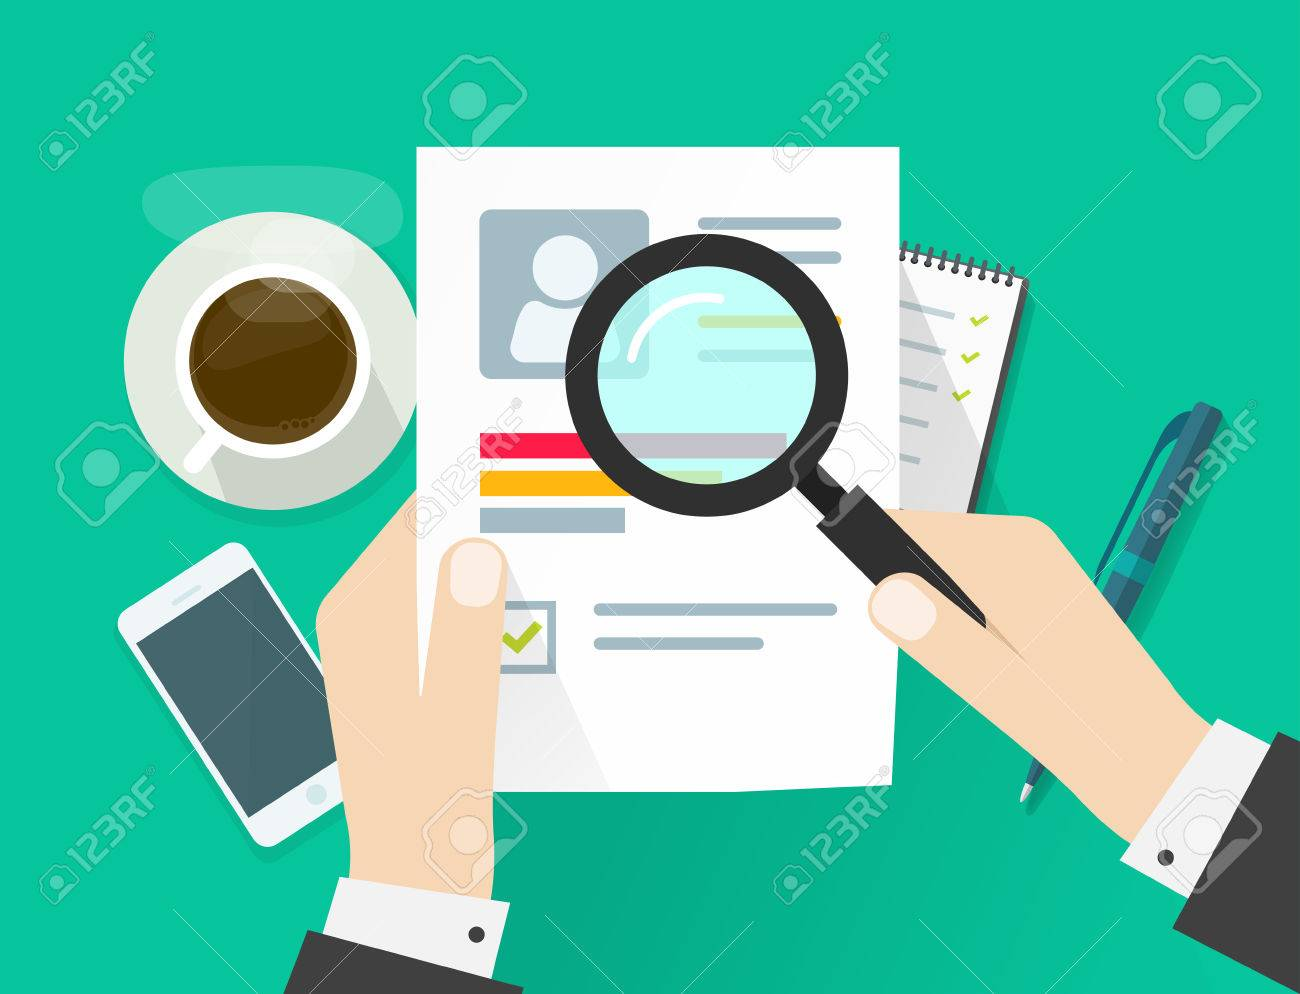 Cv Anwendung Papierblatt Geschäftsmann Hände Lebenslauf Dokument